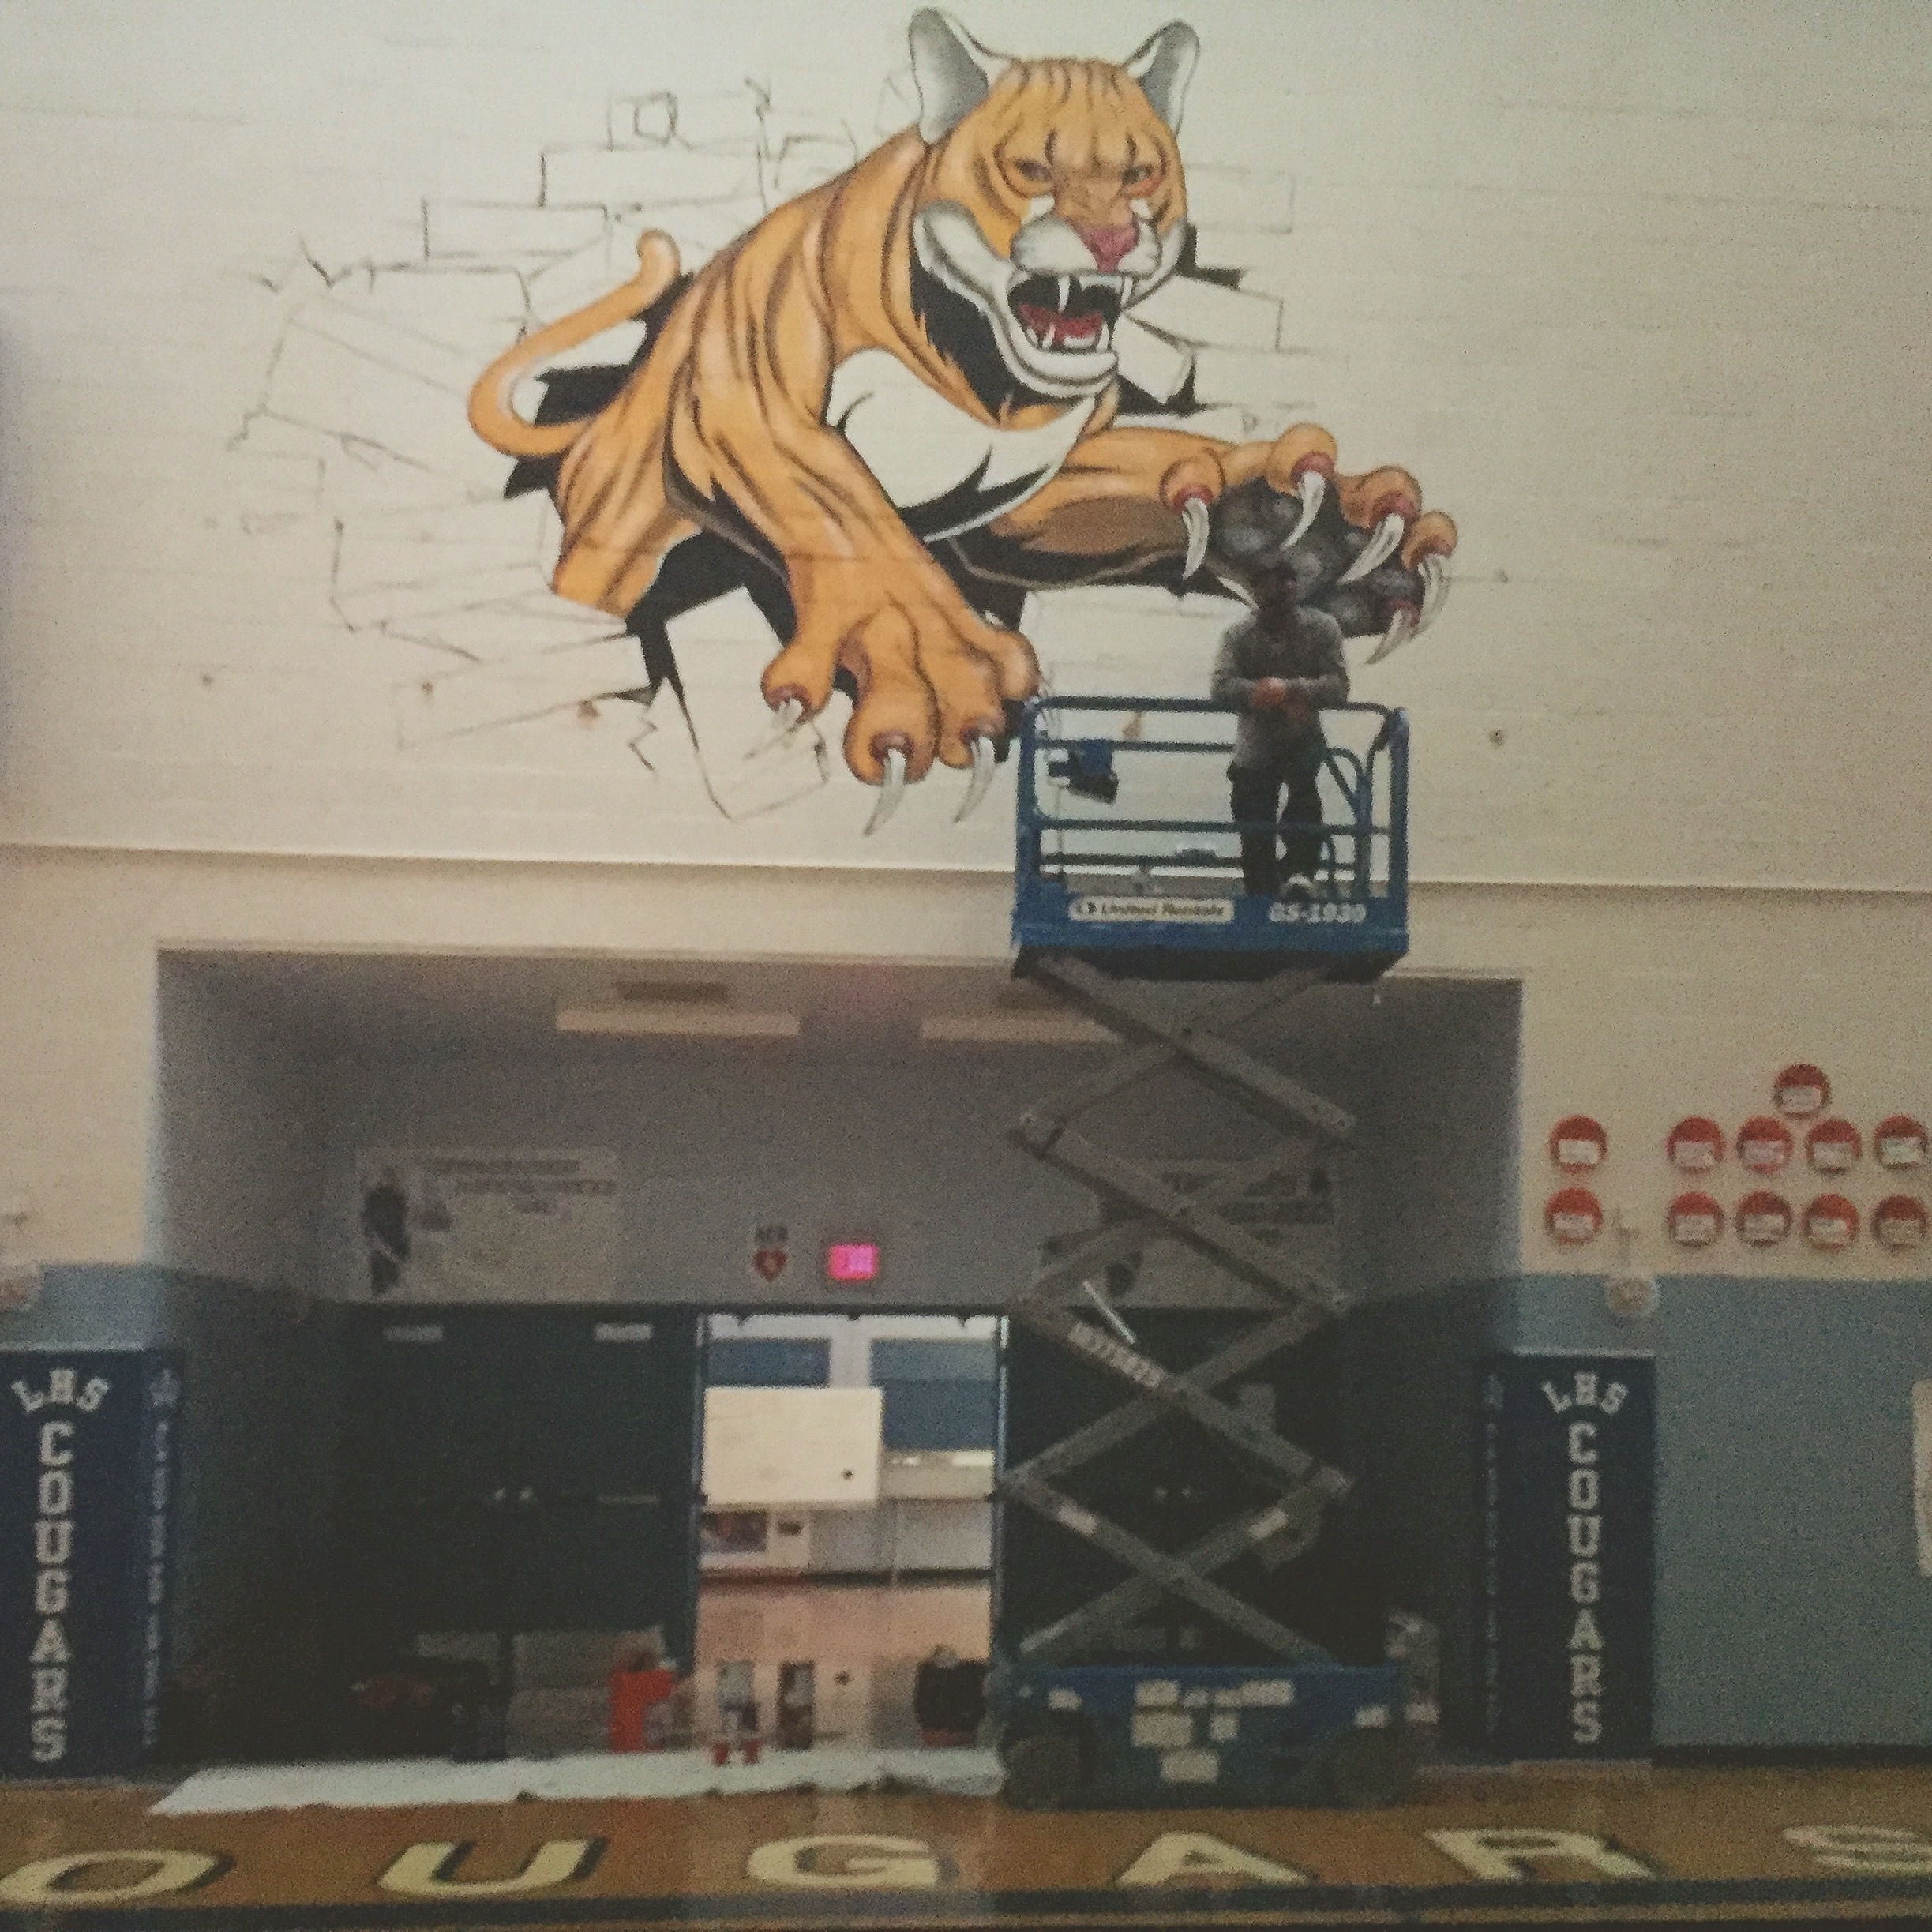 Laughlin High School